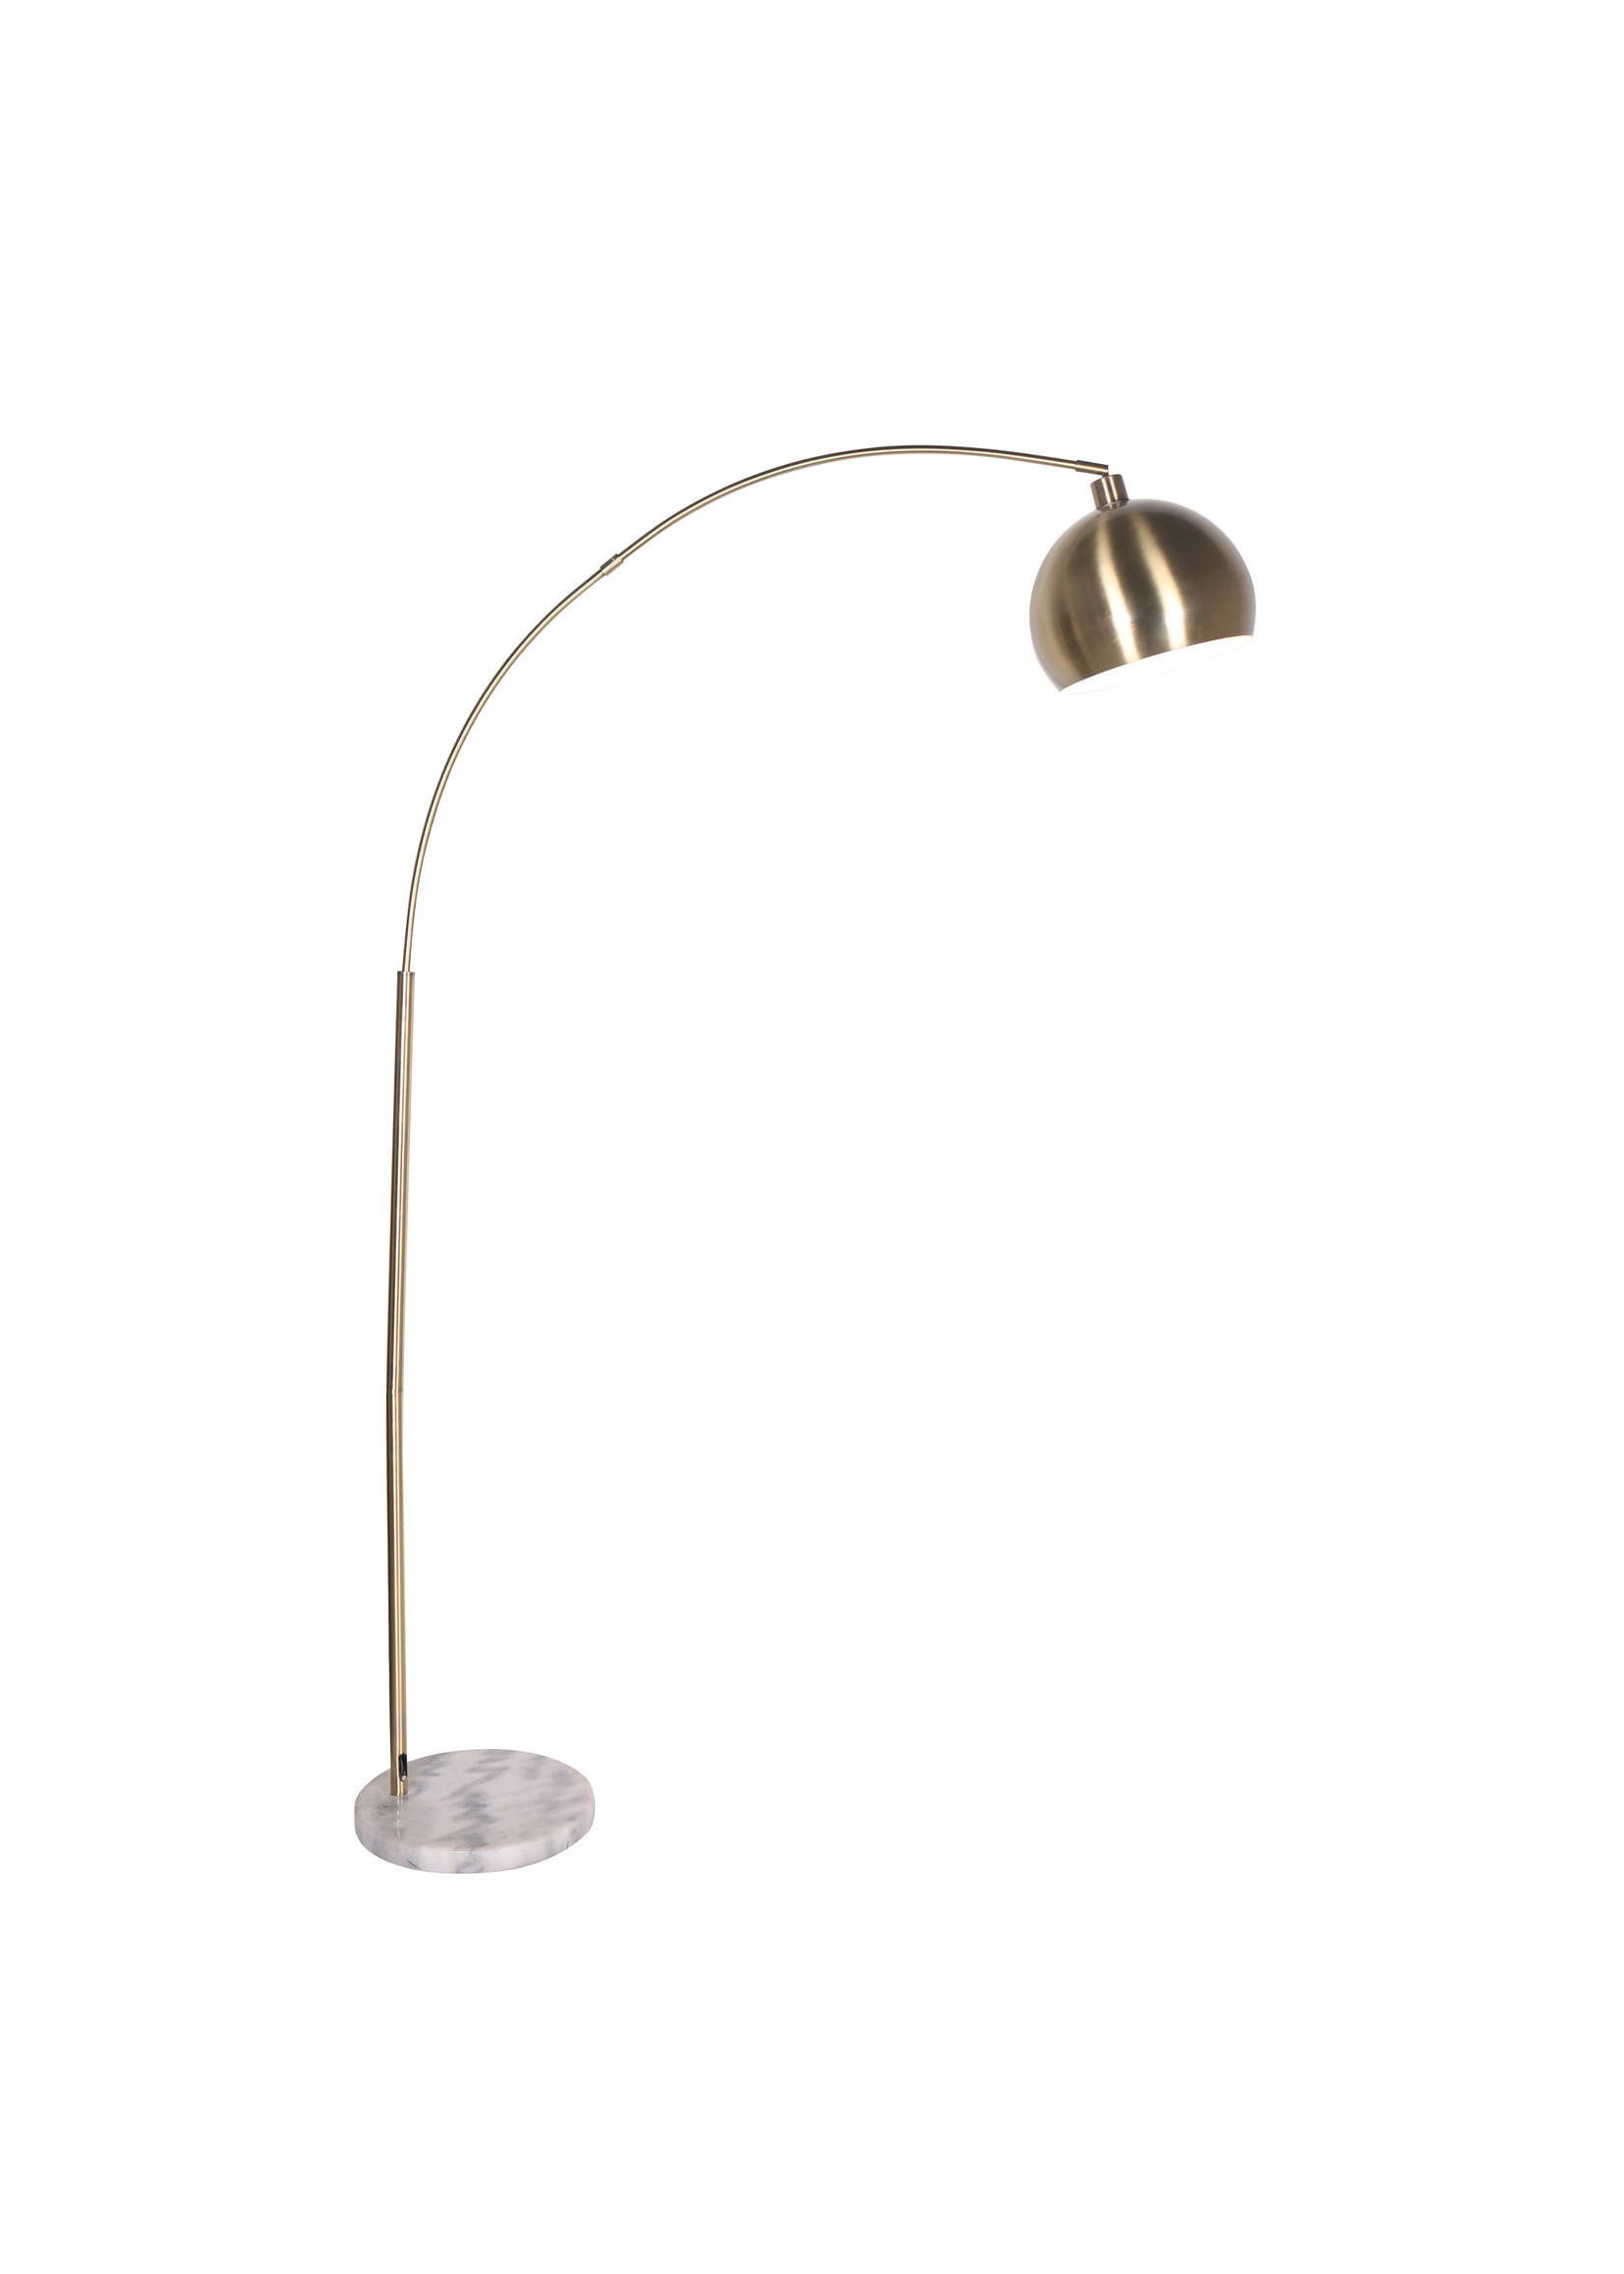 Sagebrook Home SBH Arched Floor Lamp